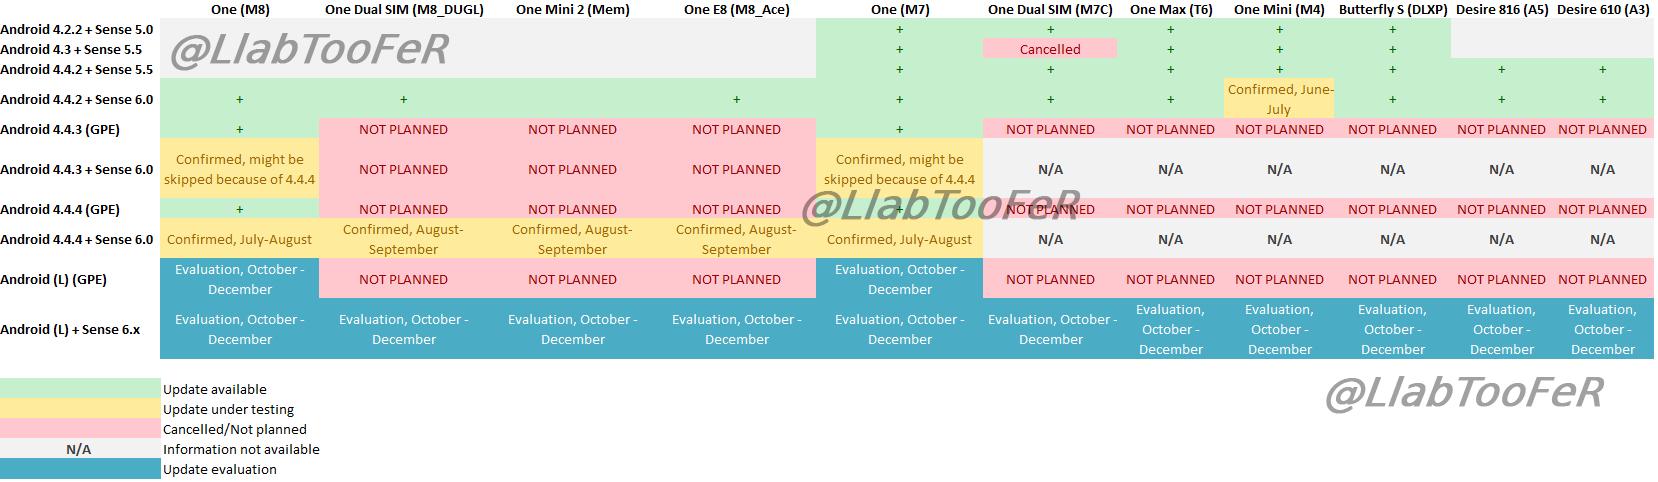 Android-Roadmap aktueller HTC-Smartphones